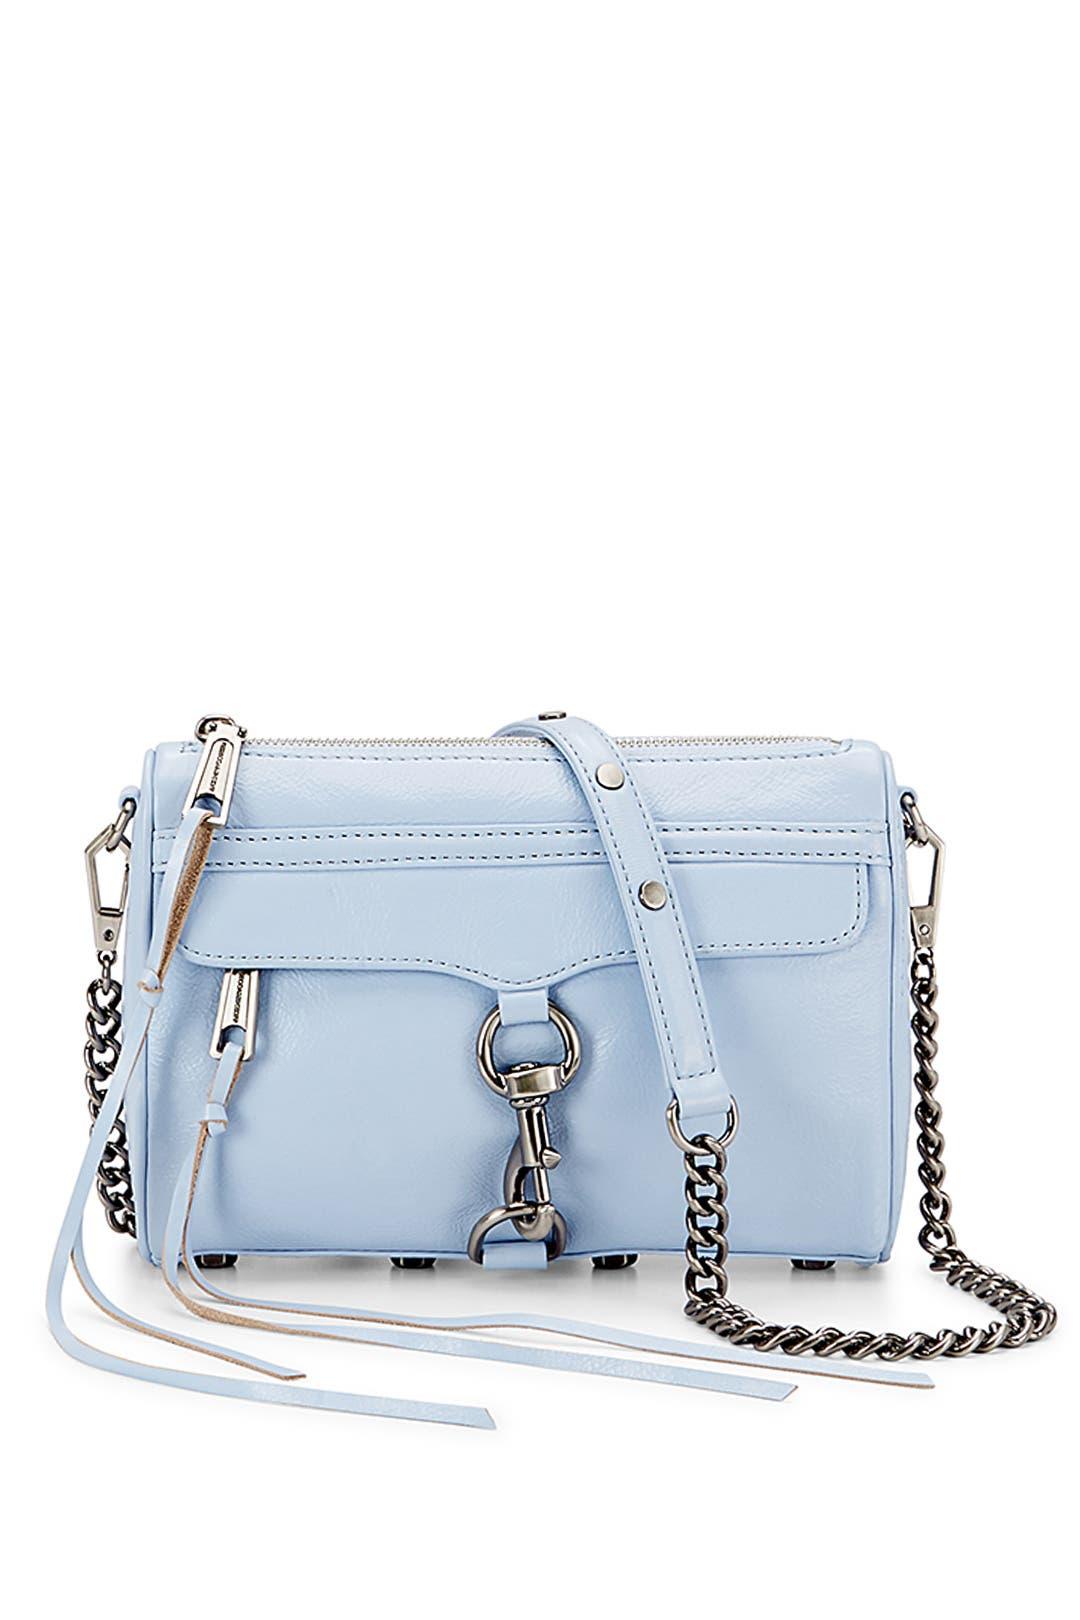 Blue Mini Mac Cross Body Bag by Rebecca Minkoff Handbags